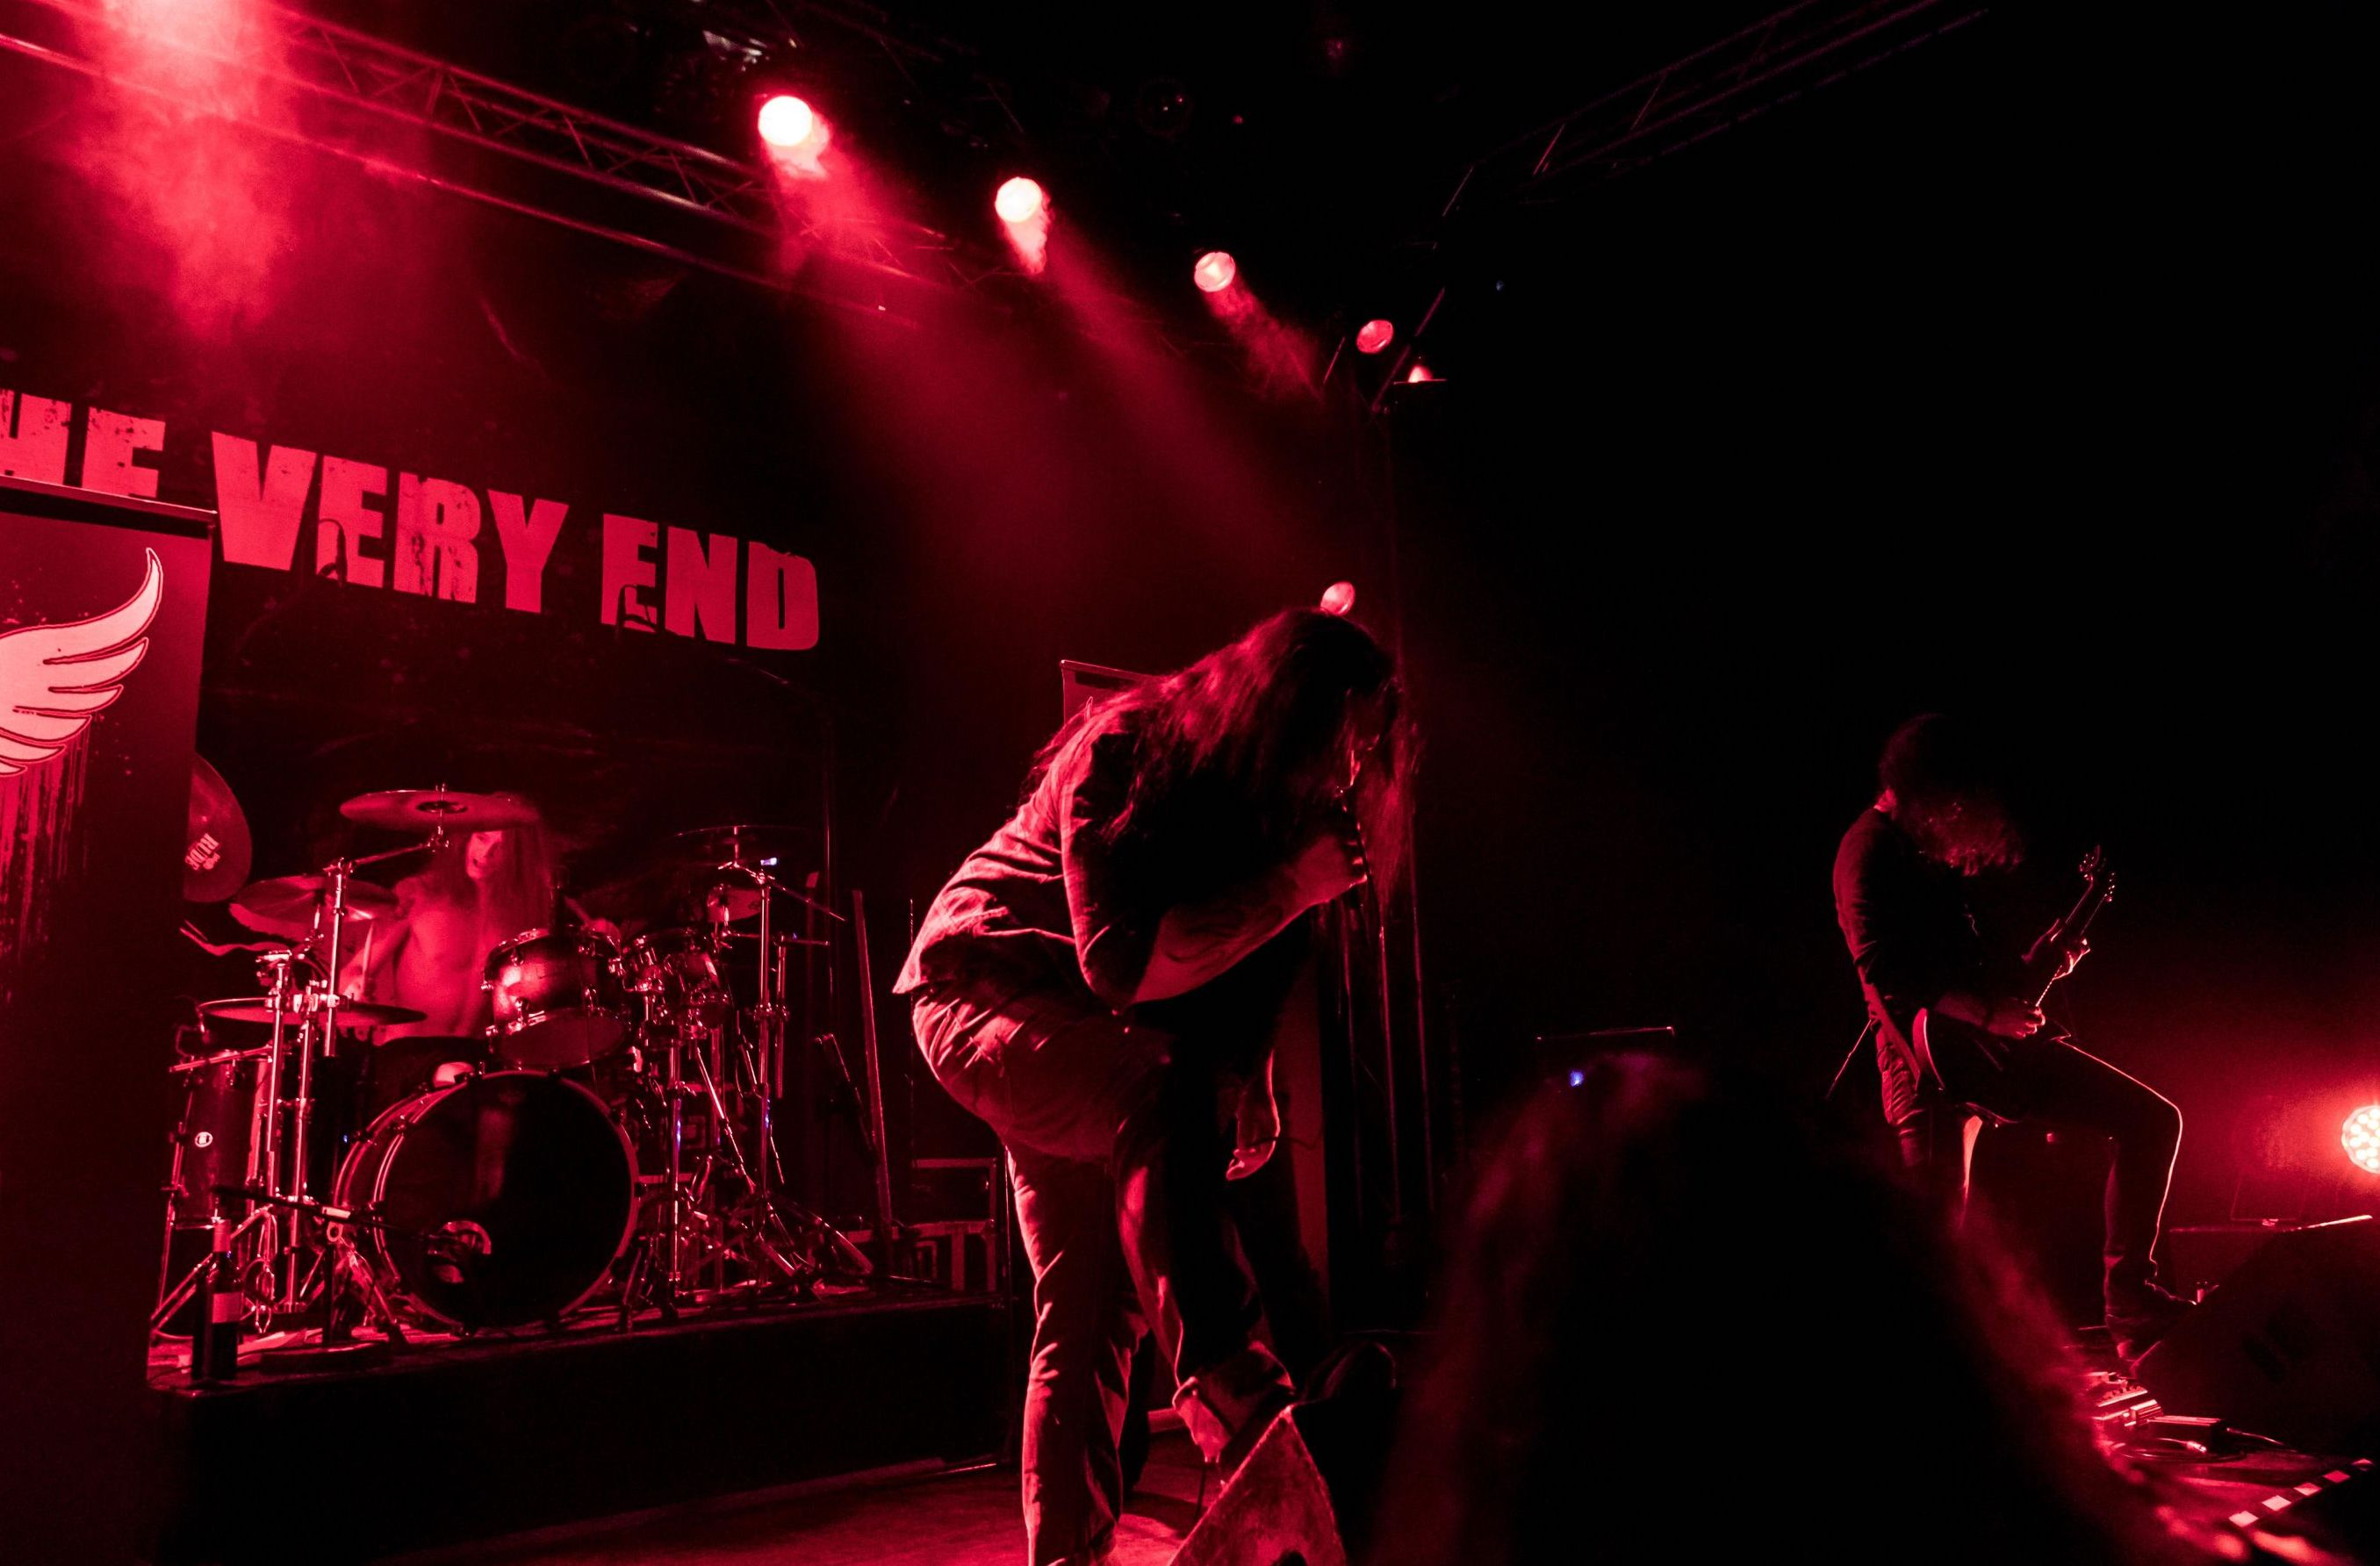 the-very-end-live-zeche-carl-essen-germany-thrash-metal_7